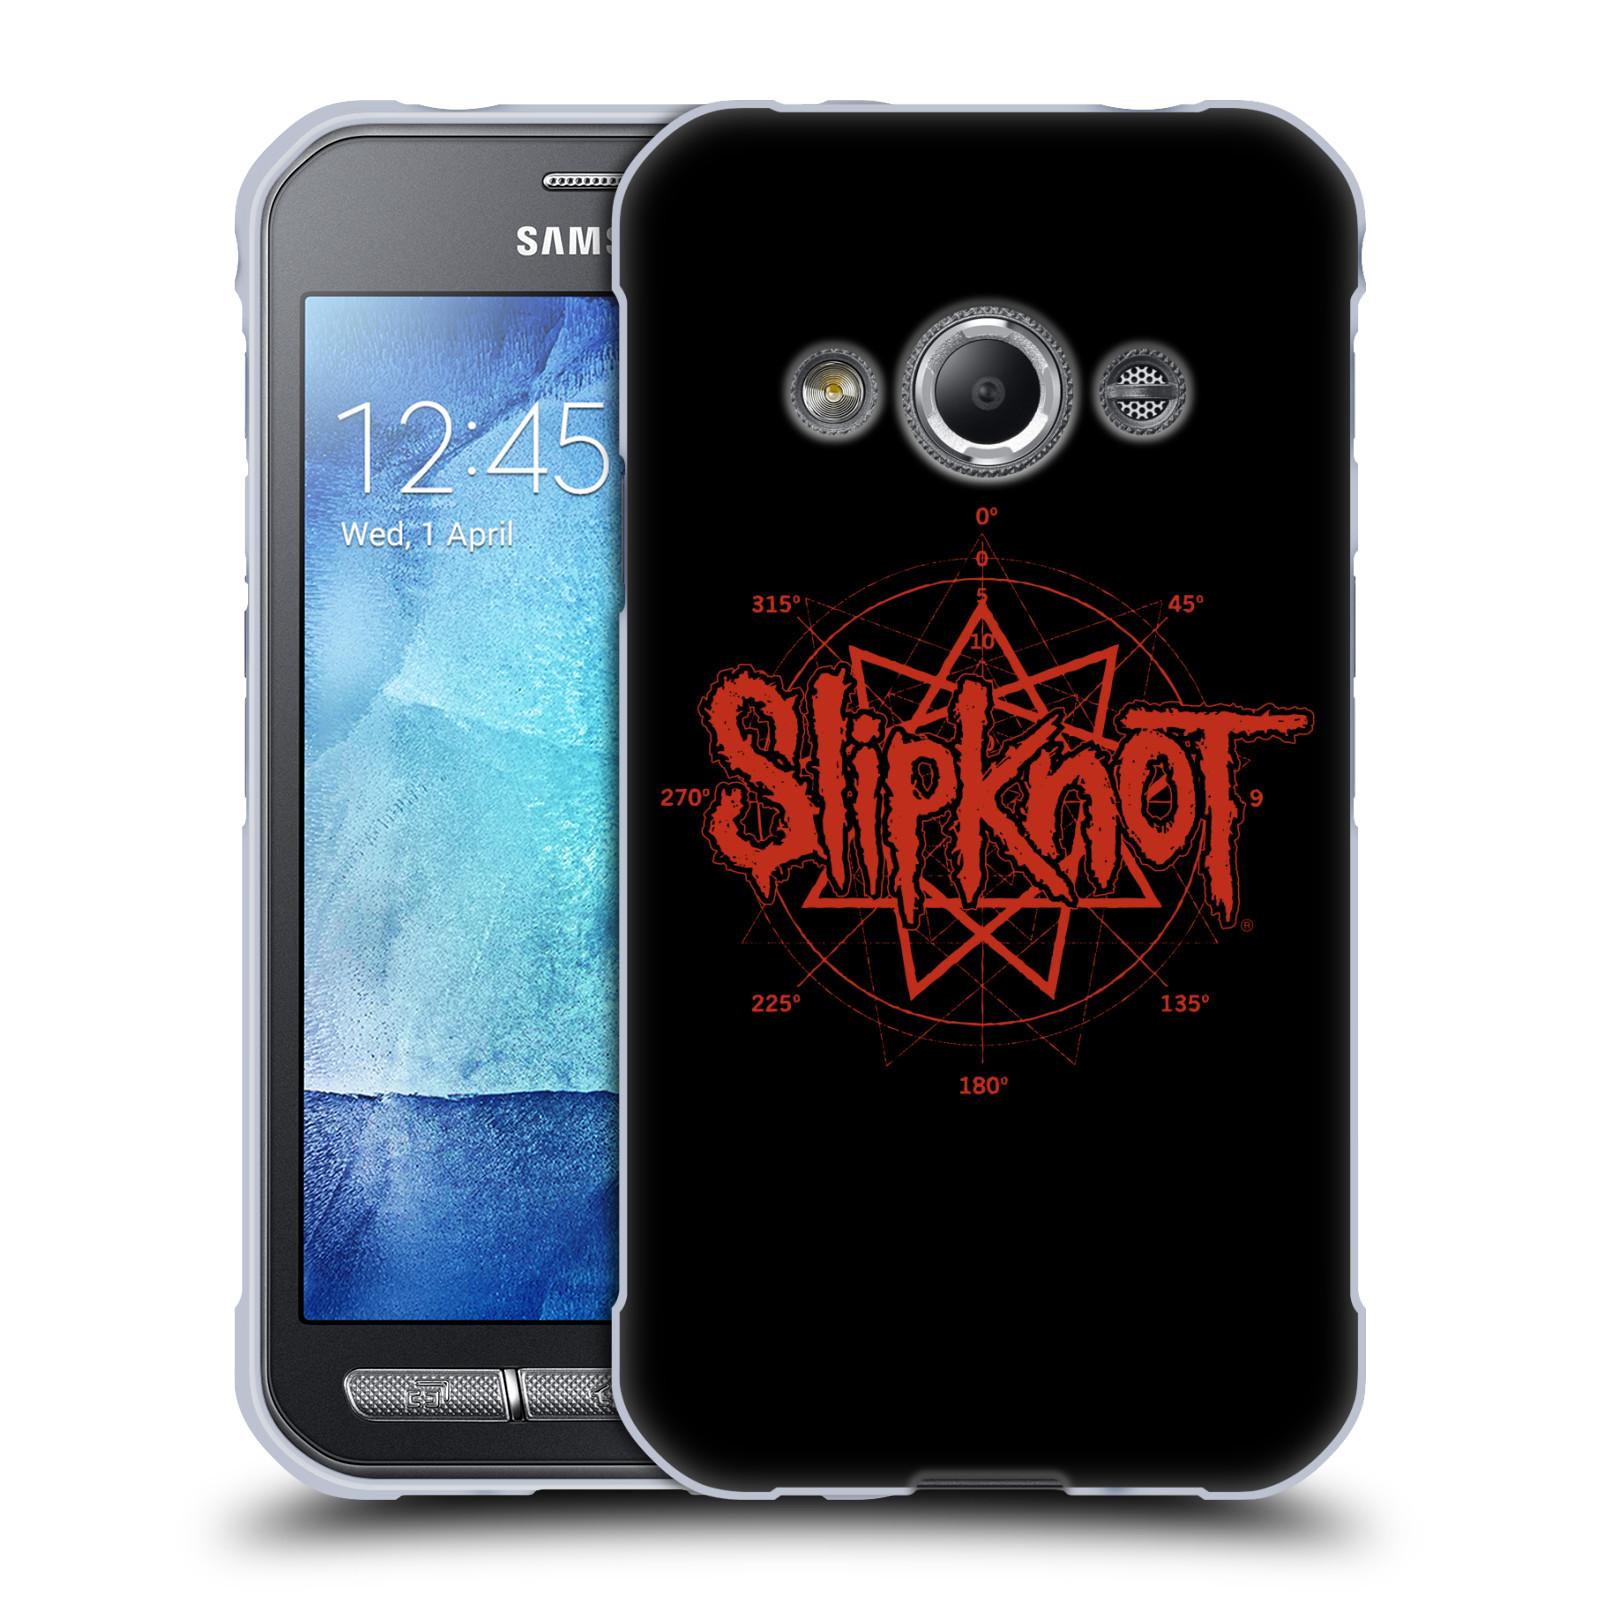 HEAD CASE silikonový obal na mobil Samsung Galaxy Xcover 3 hudební skupina Slipknot logo